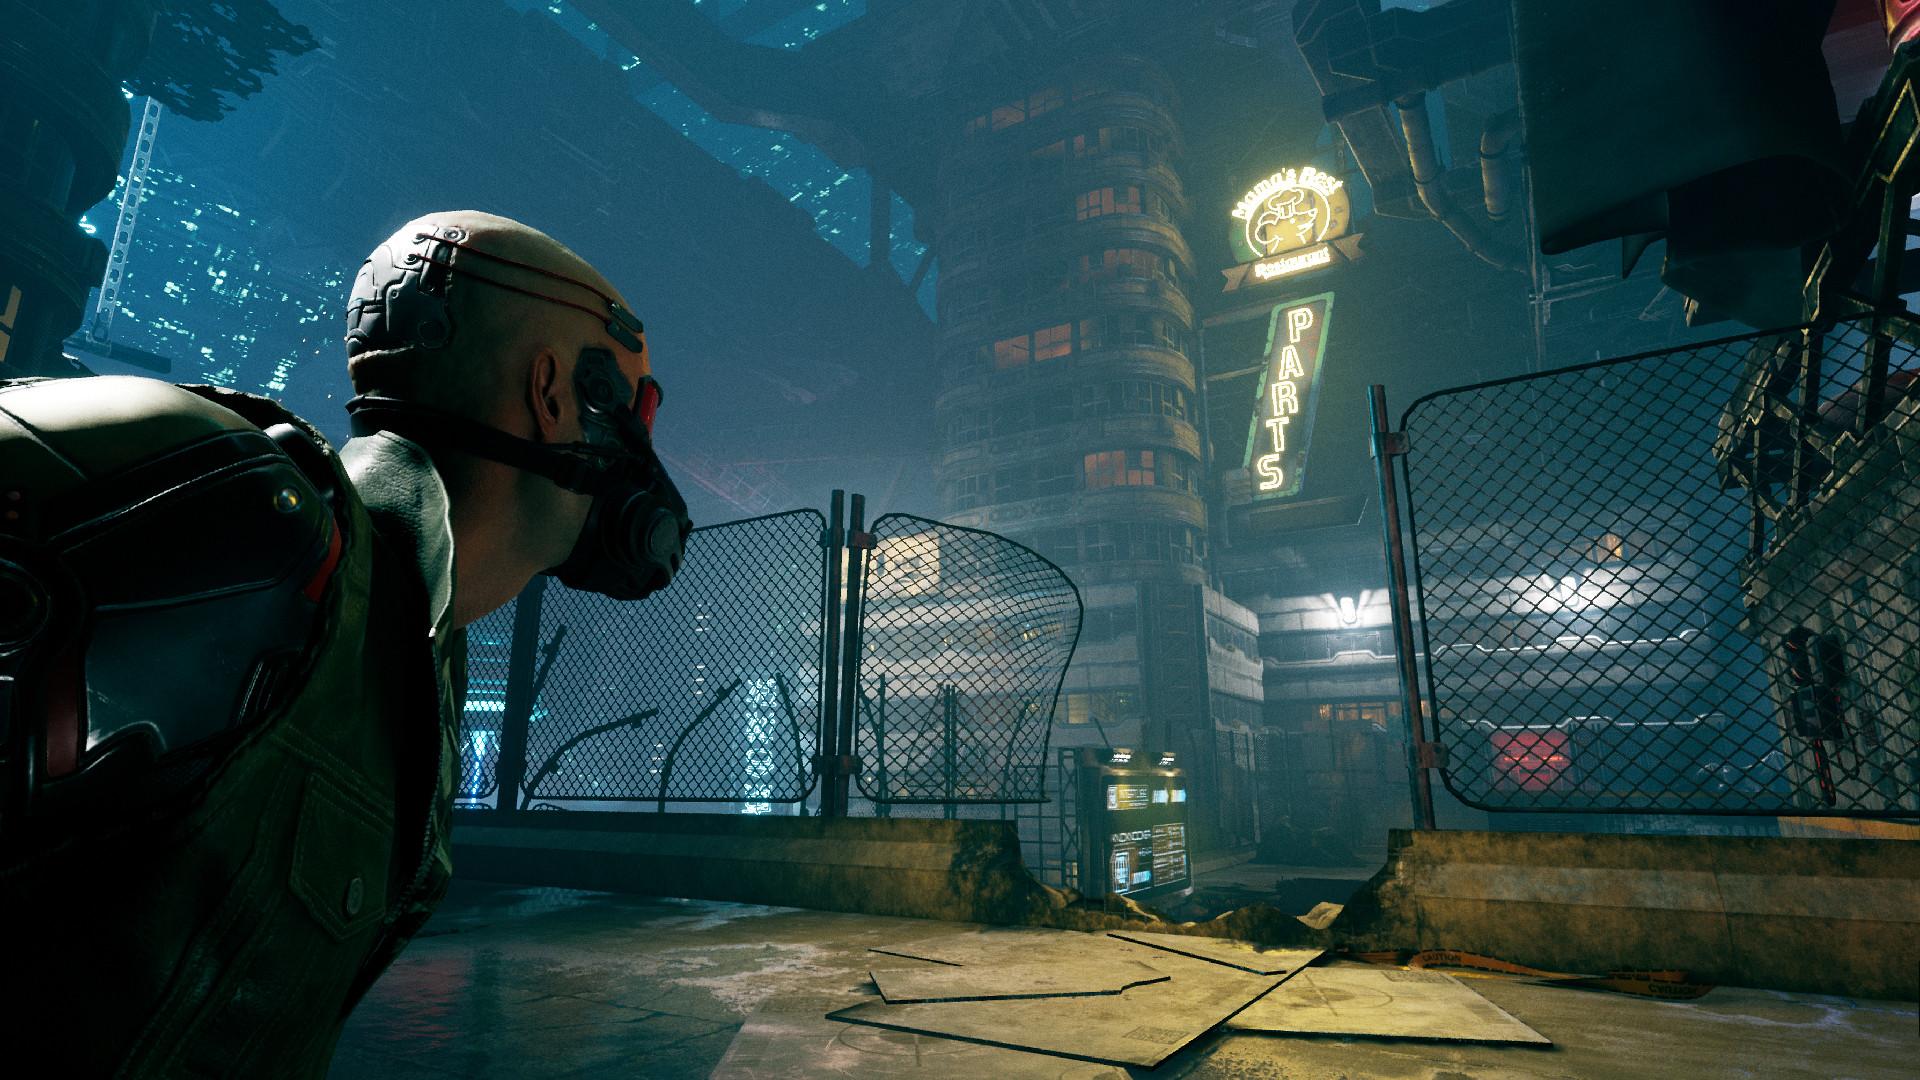 Ghostrunner: Neuer Action-Titel im Cyberpunk-Universum angekündigt – Trailer, Releasetermin & Details